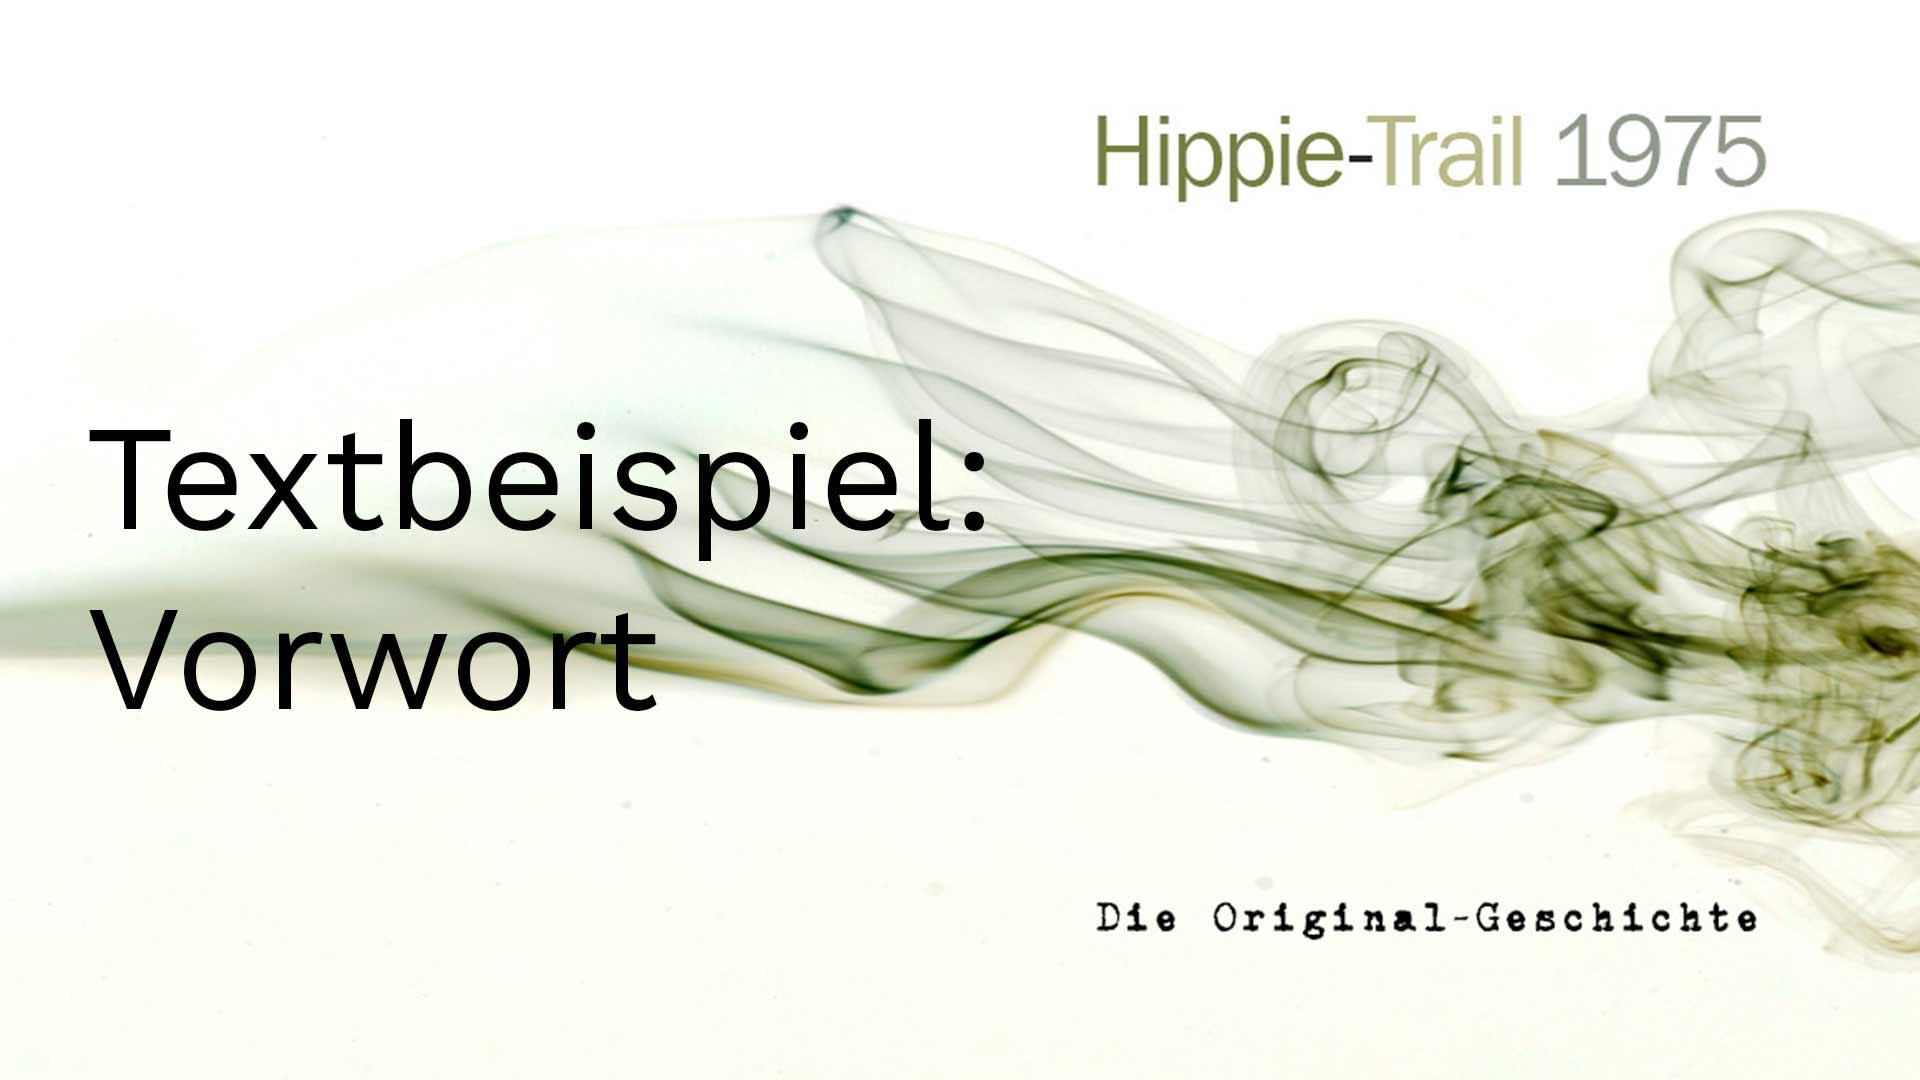 Bielefeld: Texter